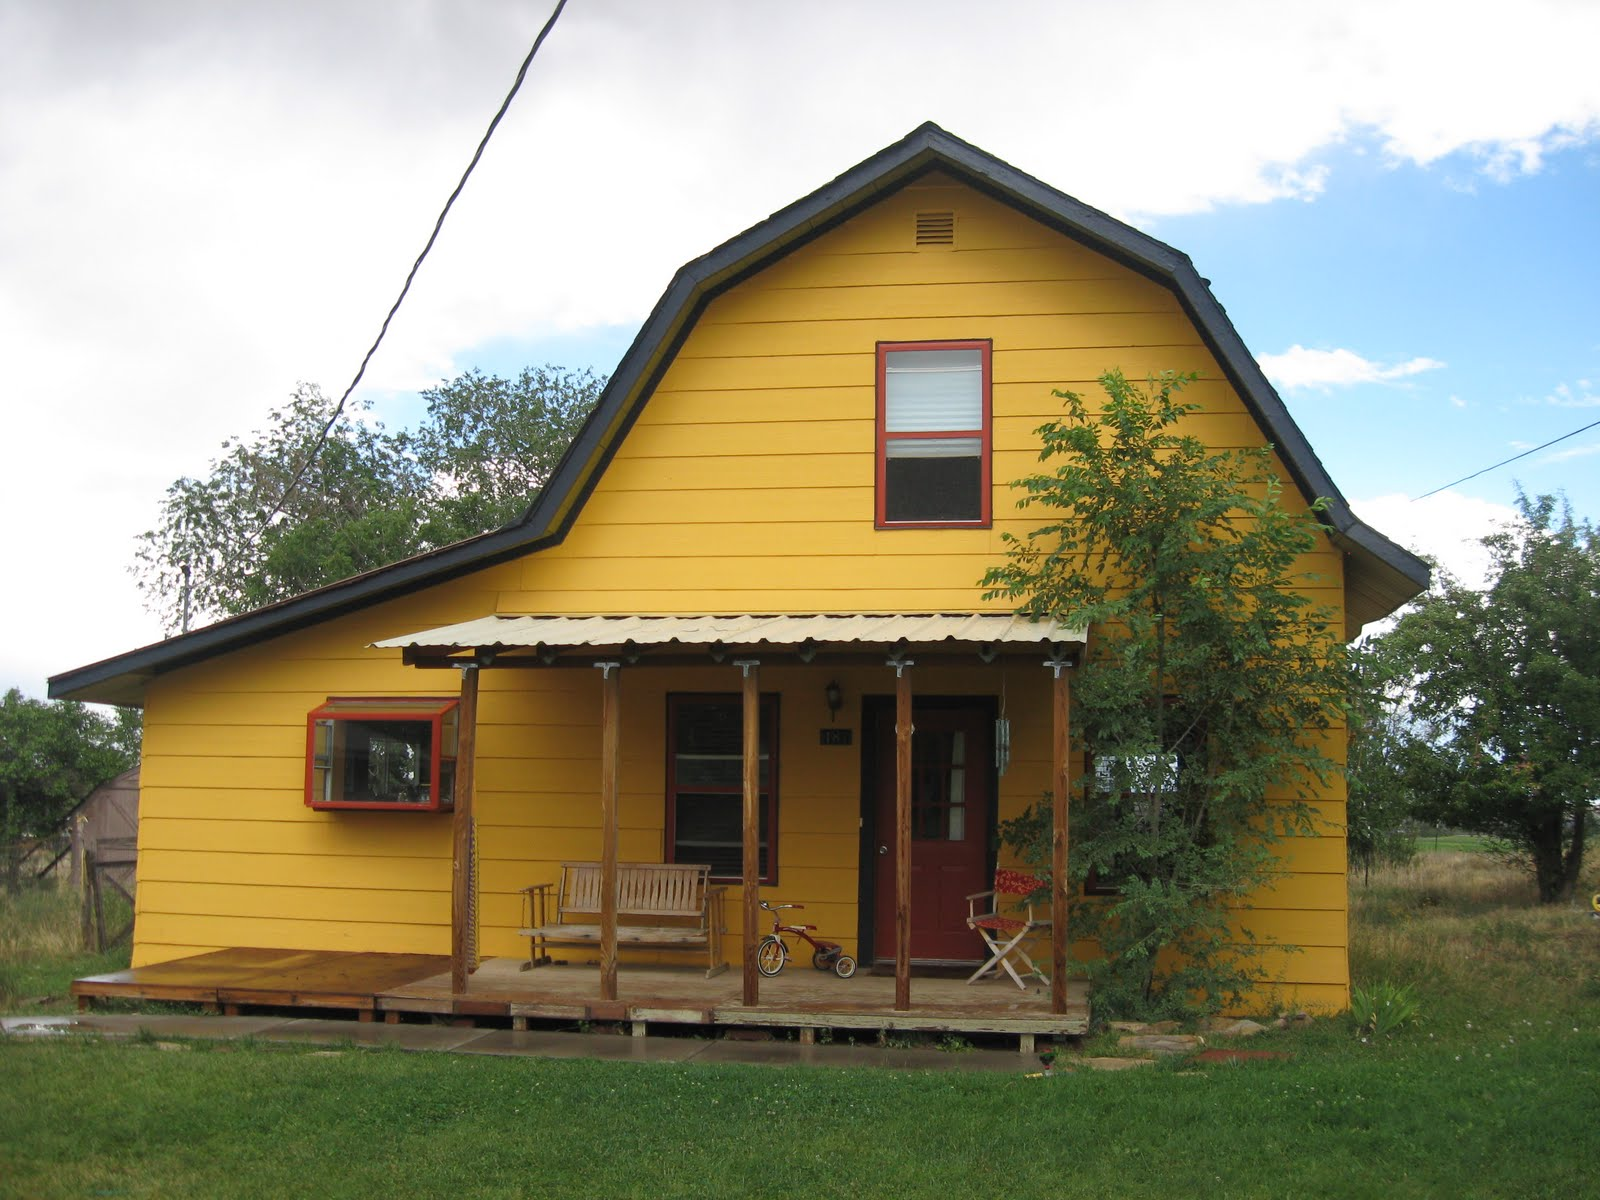 utah house for sale 1920 s barn home in monticello utah